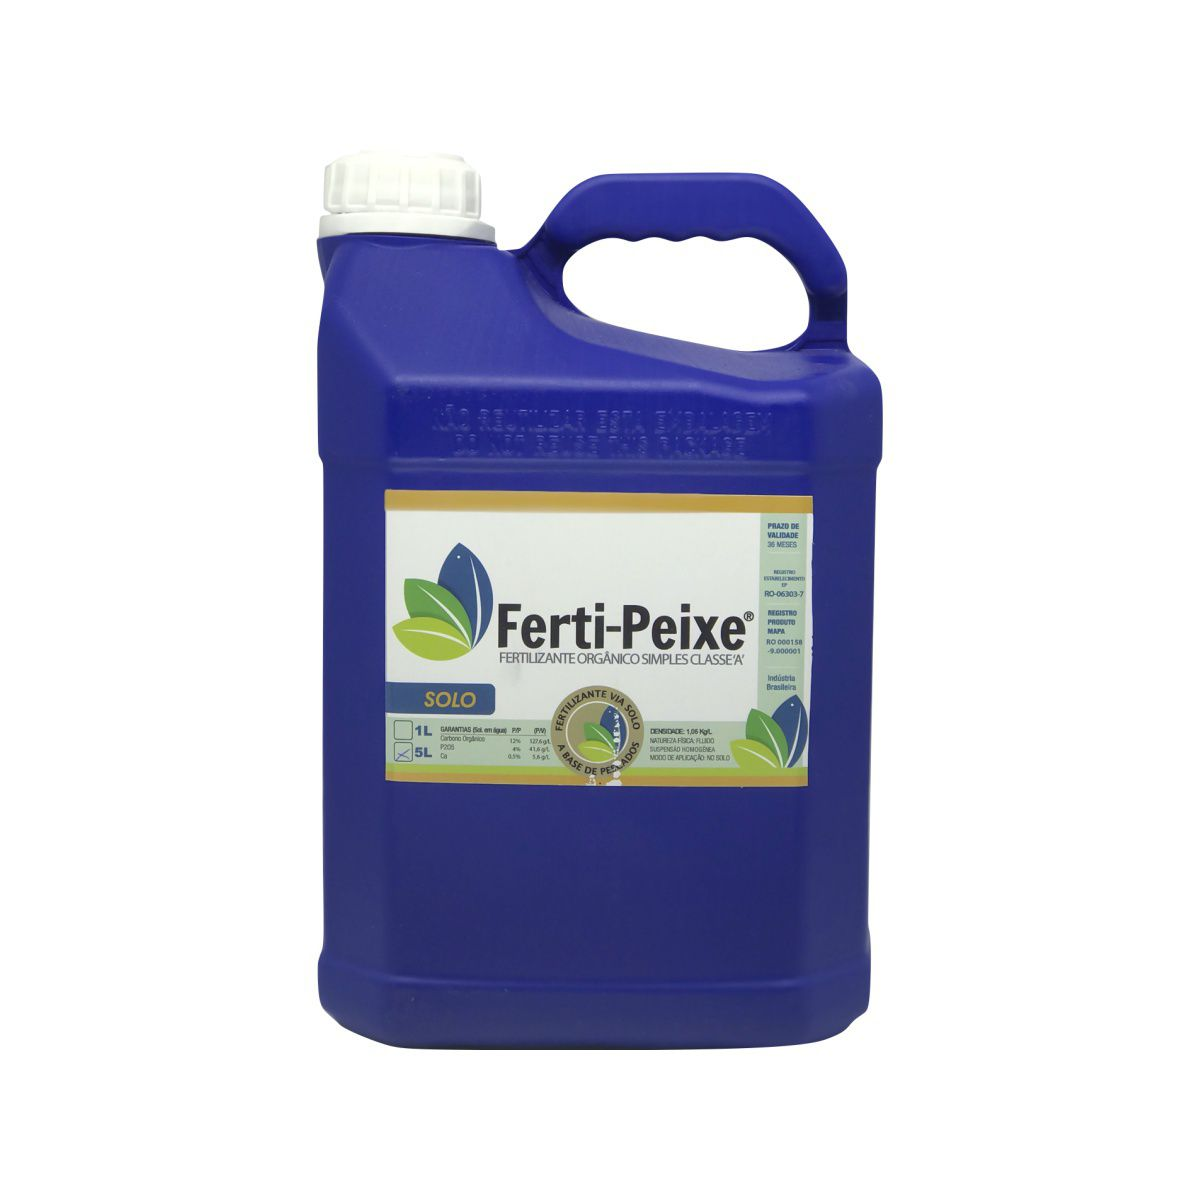 Fertilizante Orgânico Classe A (via solo) 5 litros - Ferti-Peixe